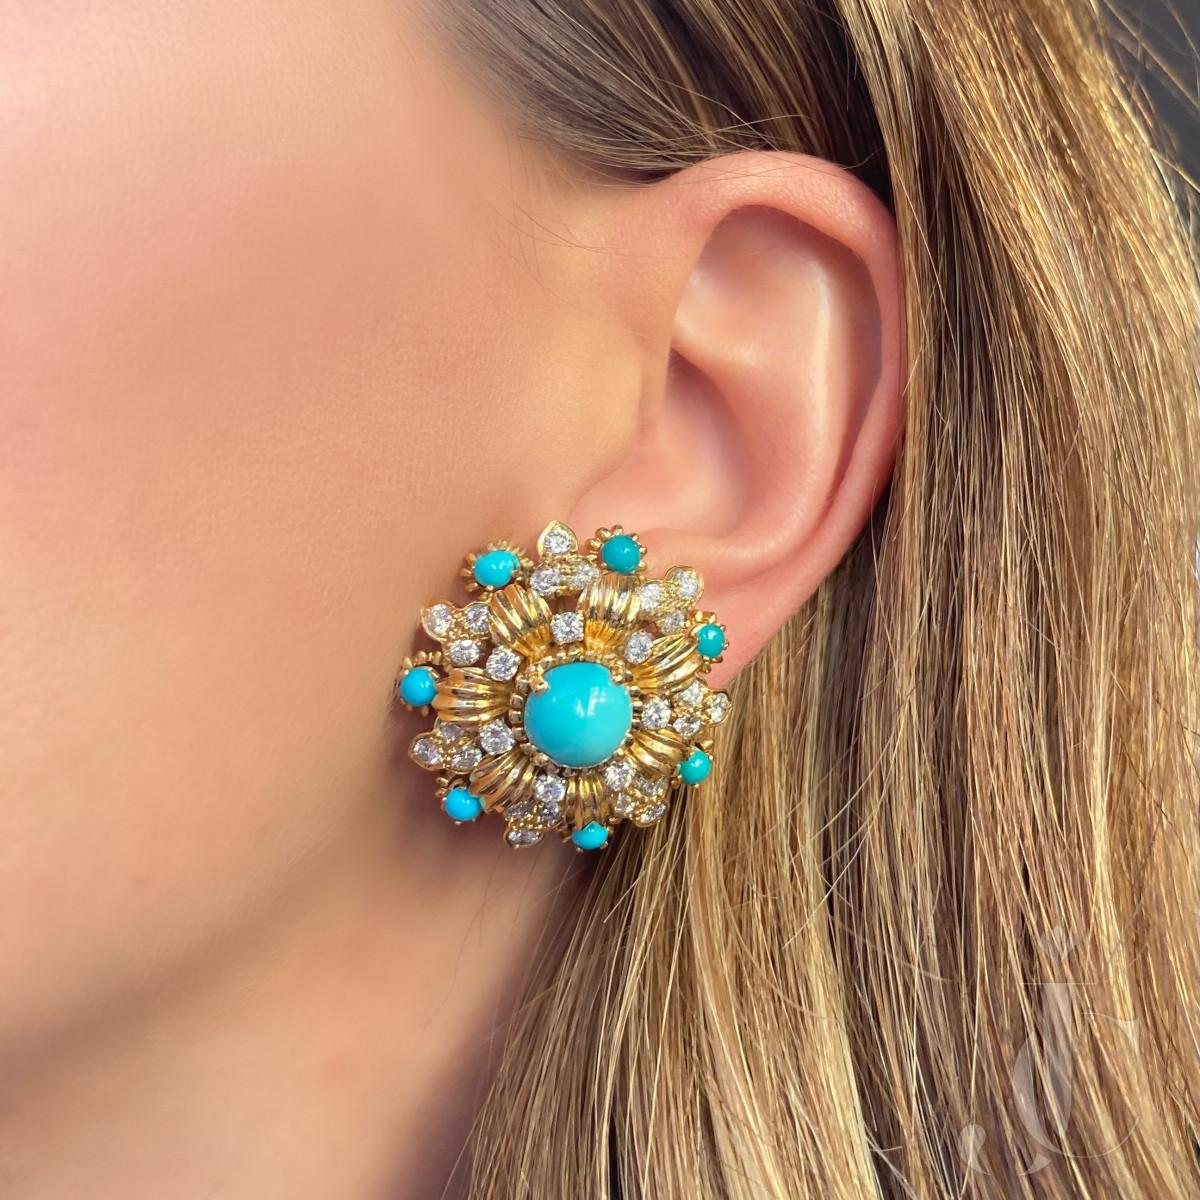 18kt Turquoise and Diamond Earclips